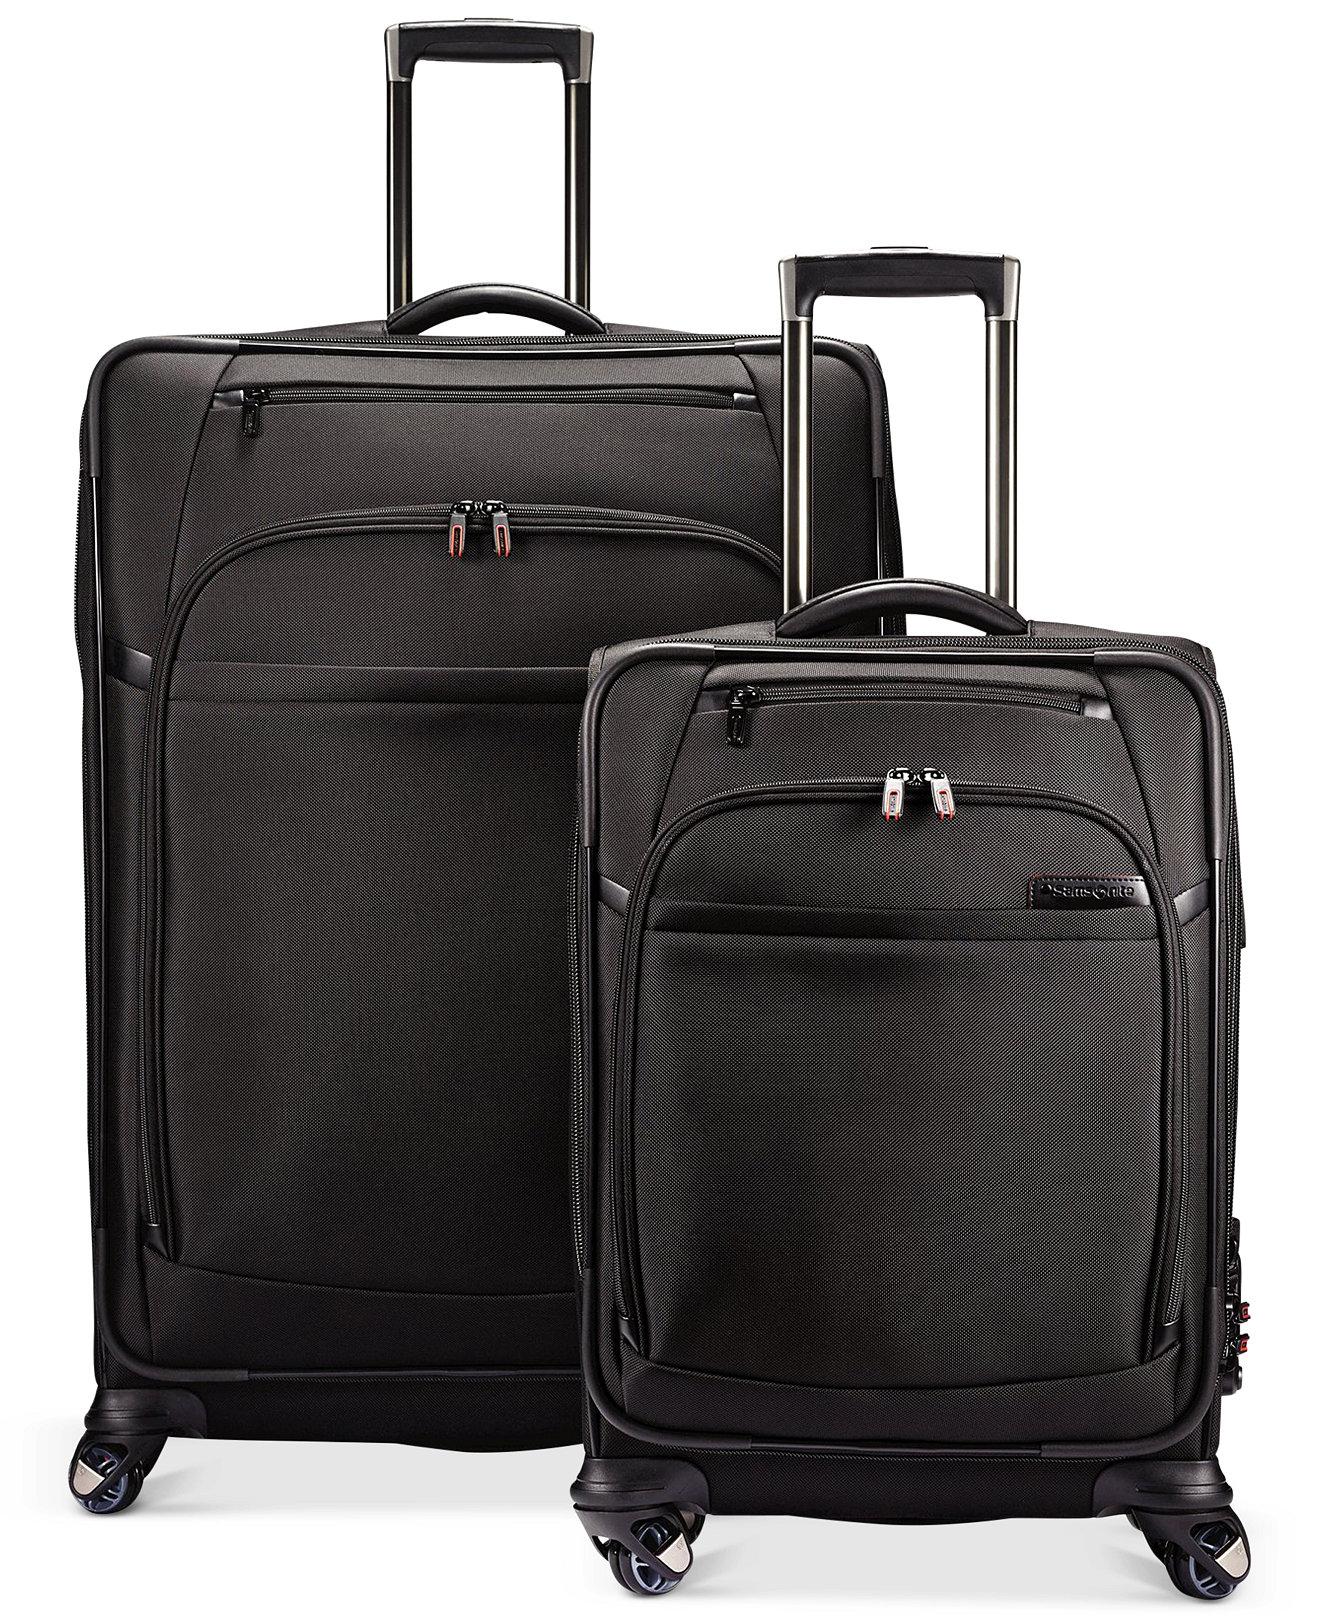 Luggage Samsonite Mc Luggage